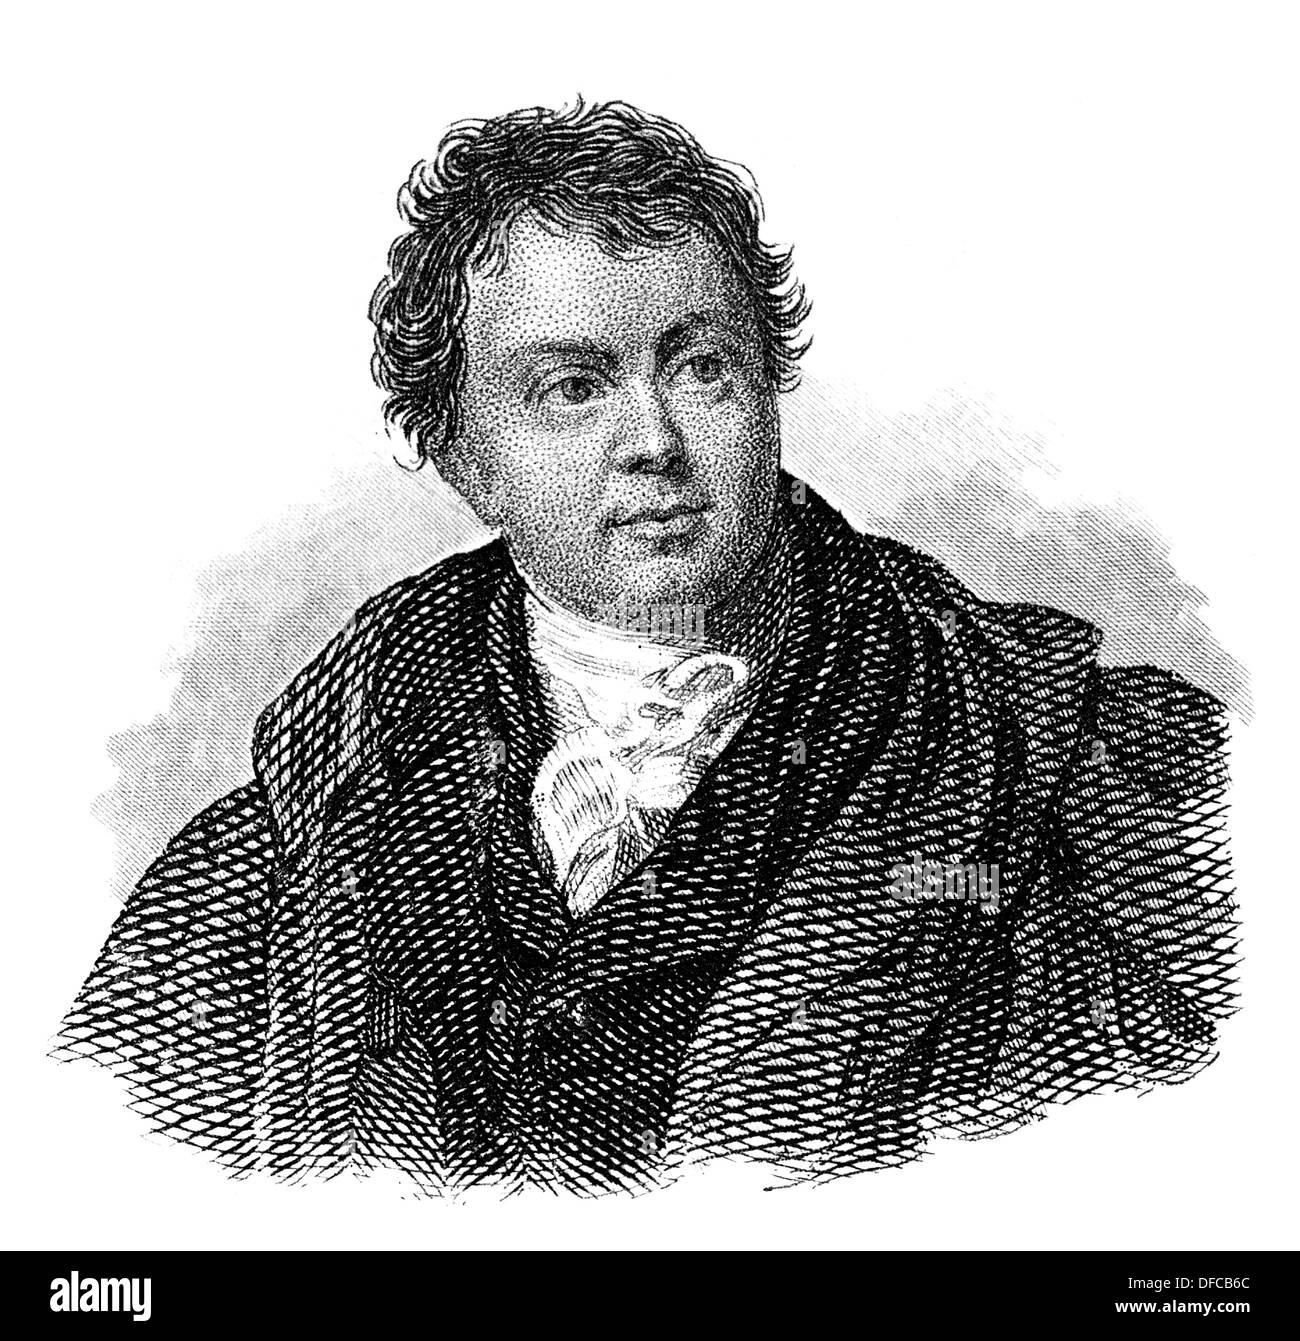 Portrait of Sir James Mackintosh, 1765 - 1832, a Scottish jurist, politician and historian - Stock Image